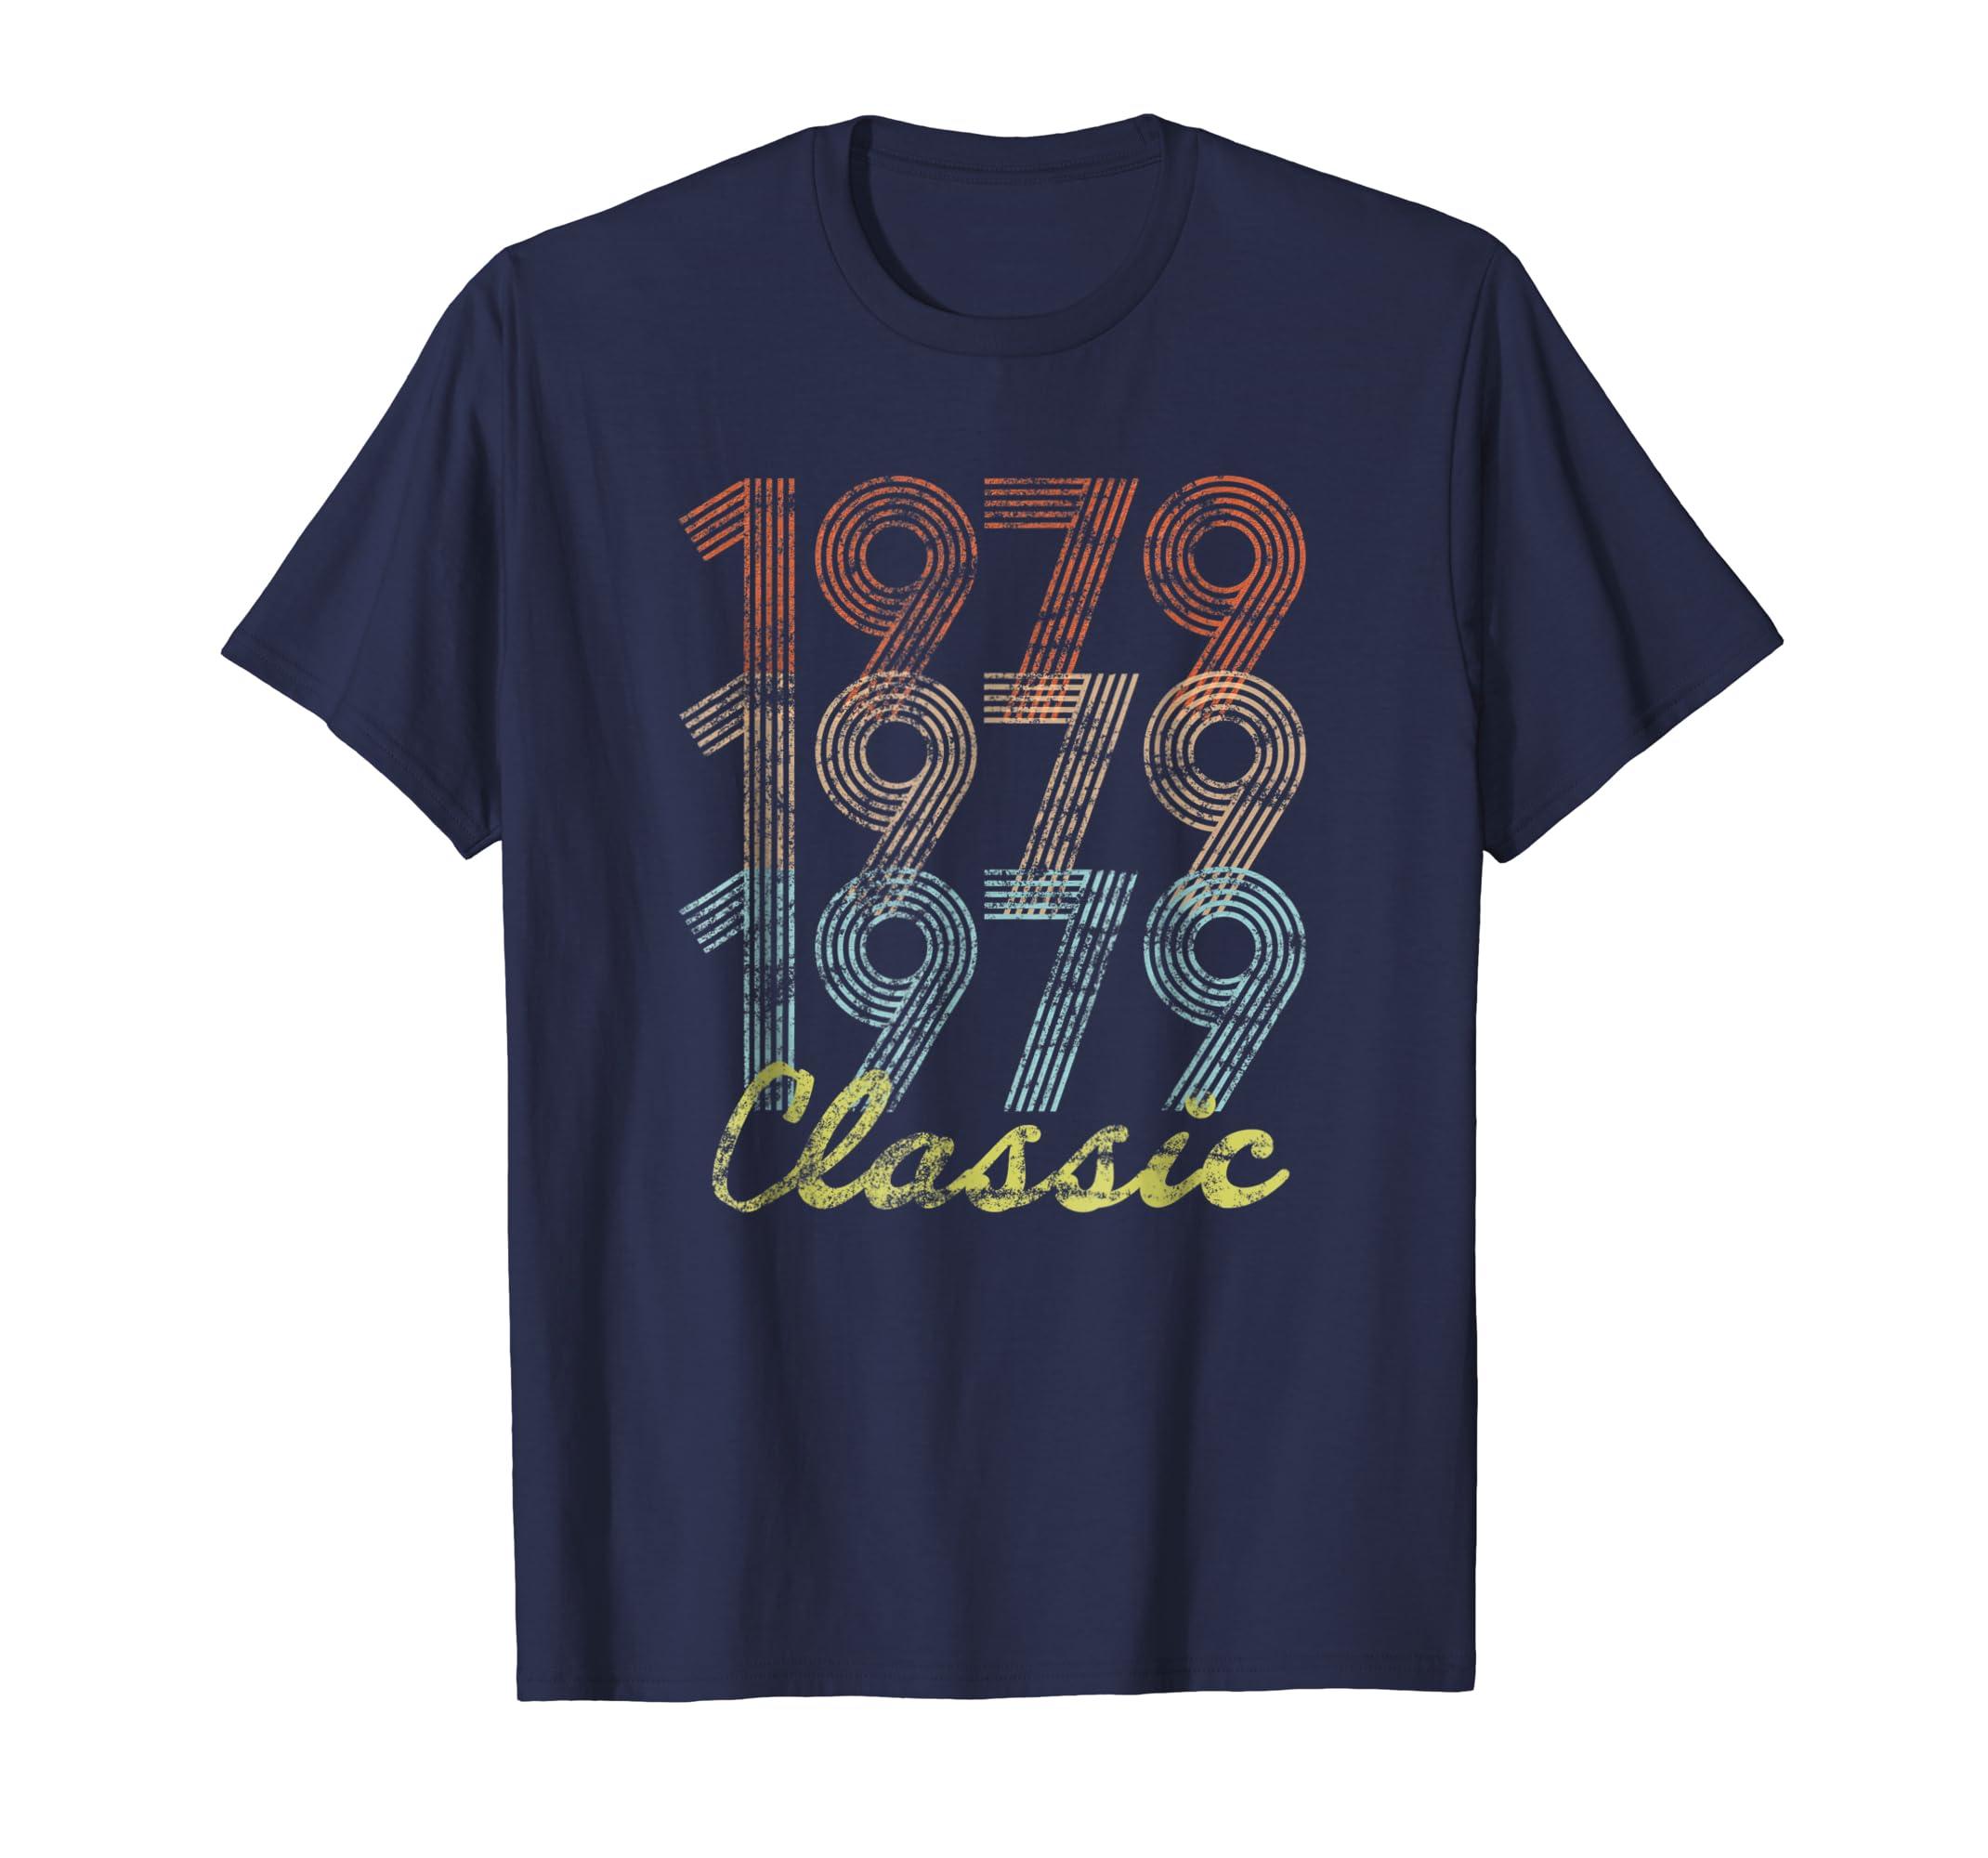 1979 Classic Vintage Distressed 40th Birthday T shirt-azvn